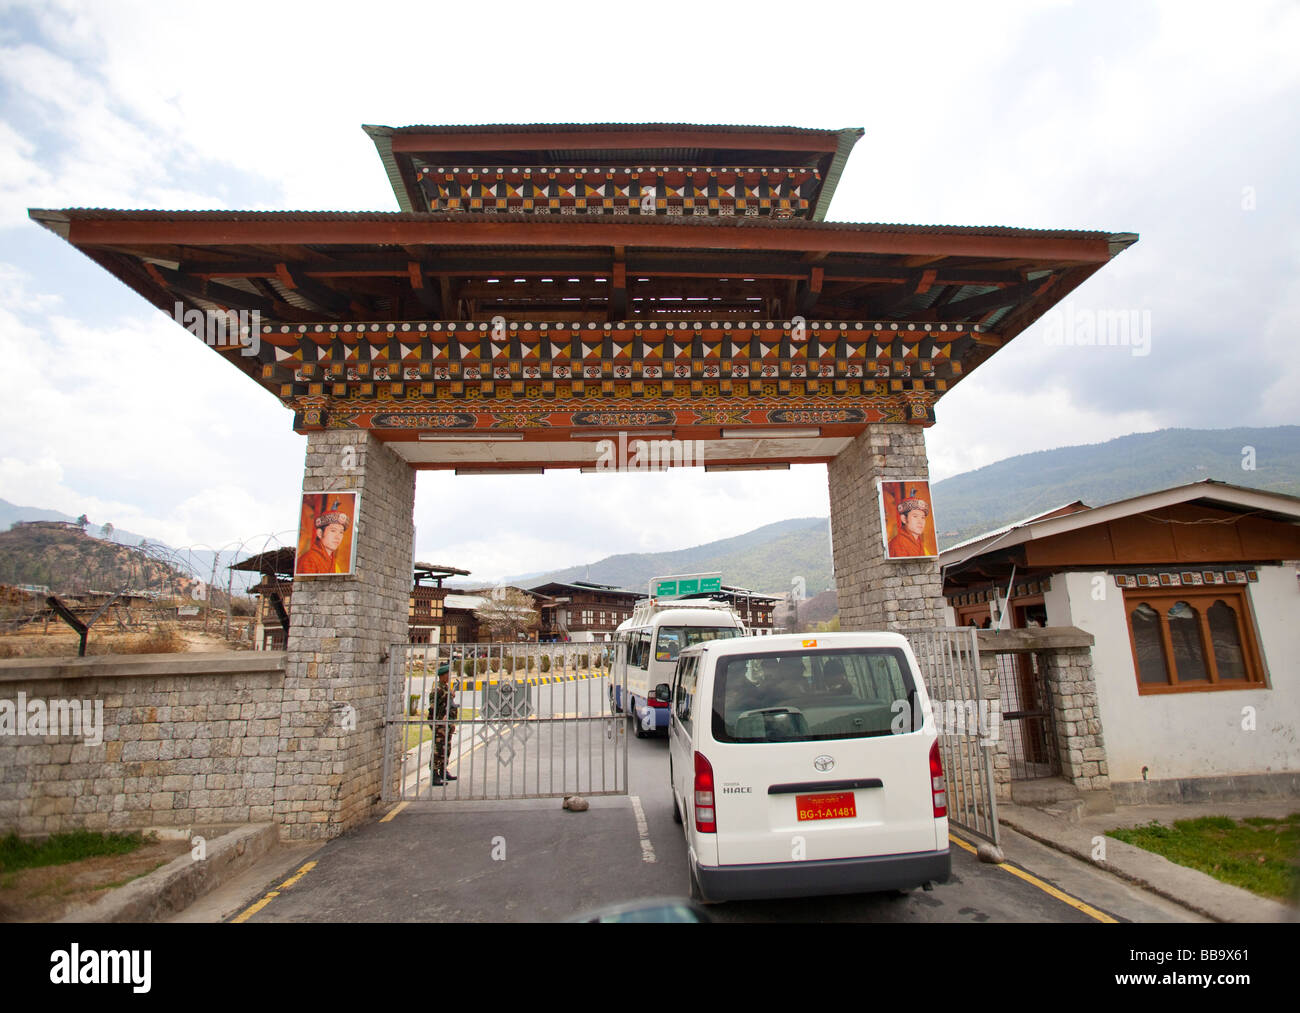 Main entrance gate of Paro Airport, Bhutan Asia horizontal 90601_Bhutan - Stock Image